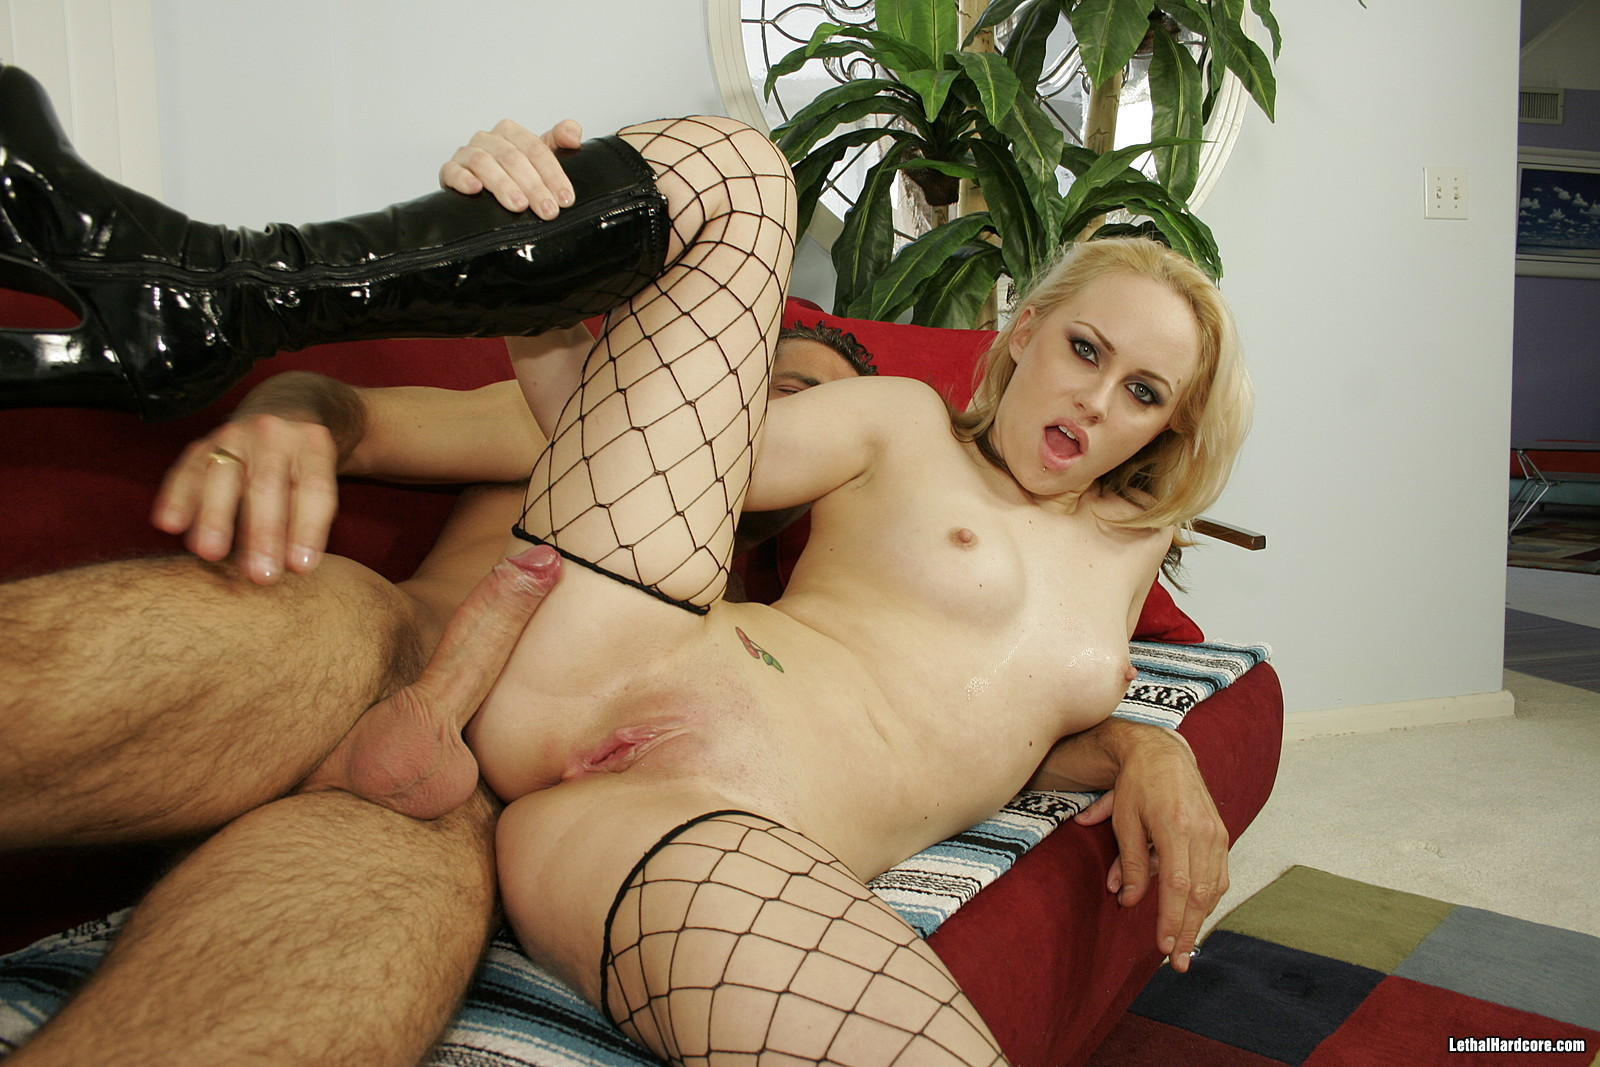 Проститутка насадилась на член мужика, даже не сняв сапоги и чулки